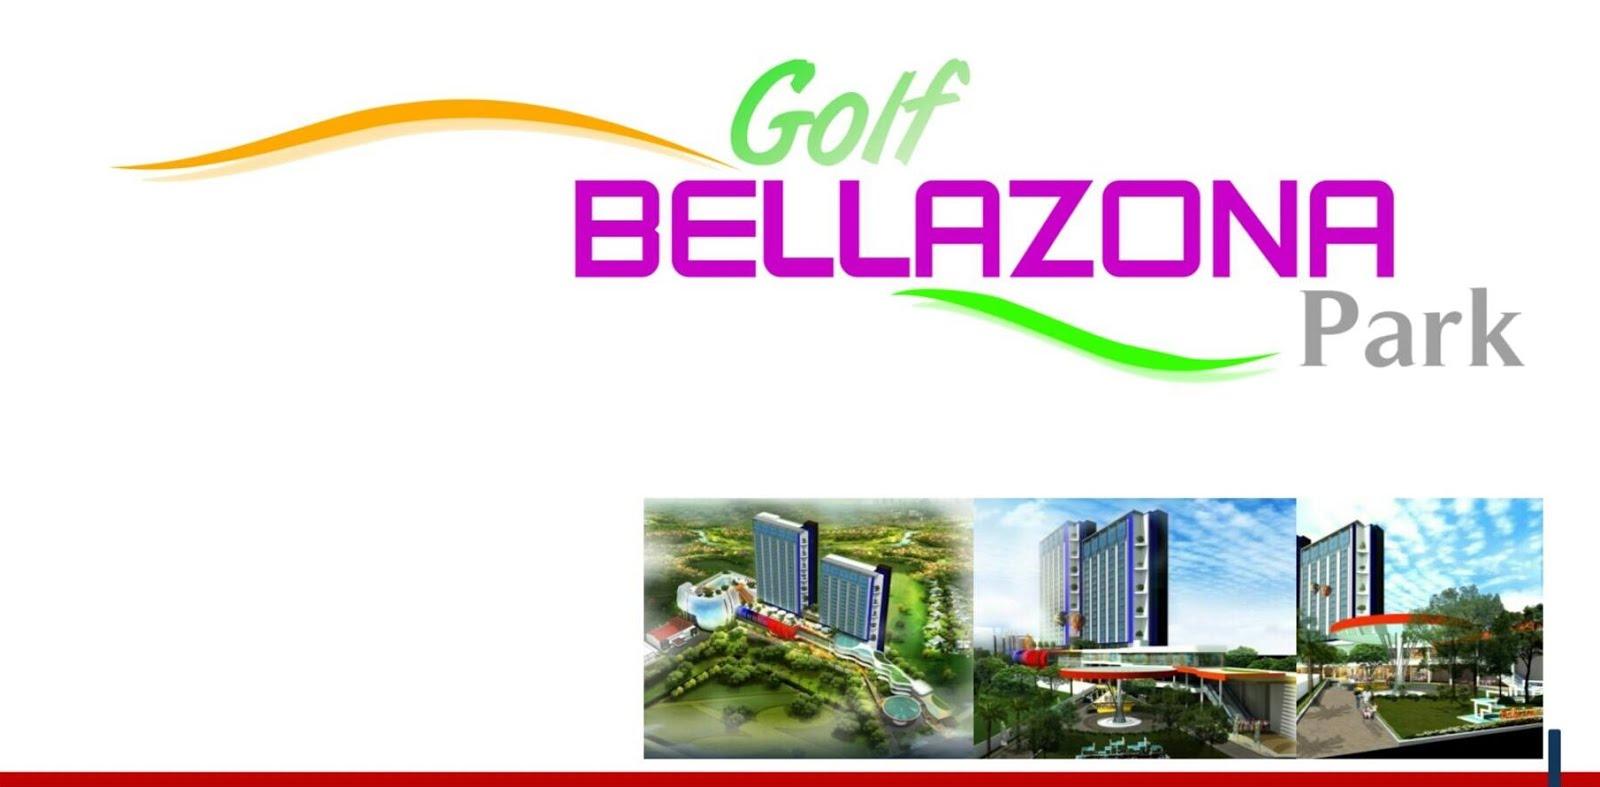 APARTEMEN GOLF BELLAZONA BANDUNG TIMUR